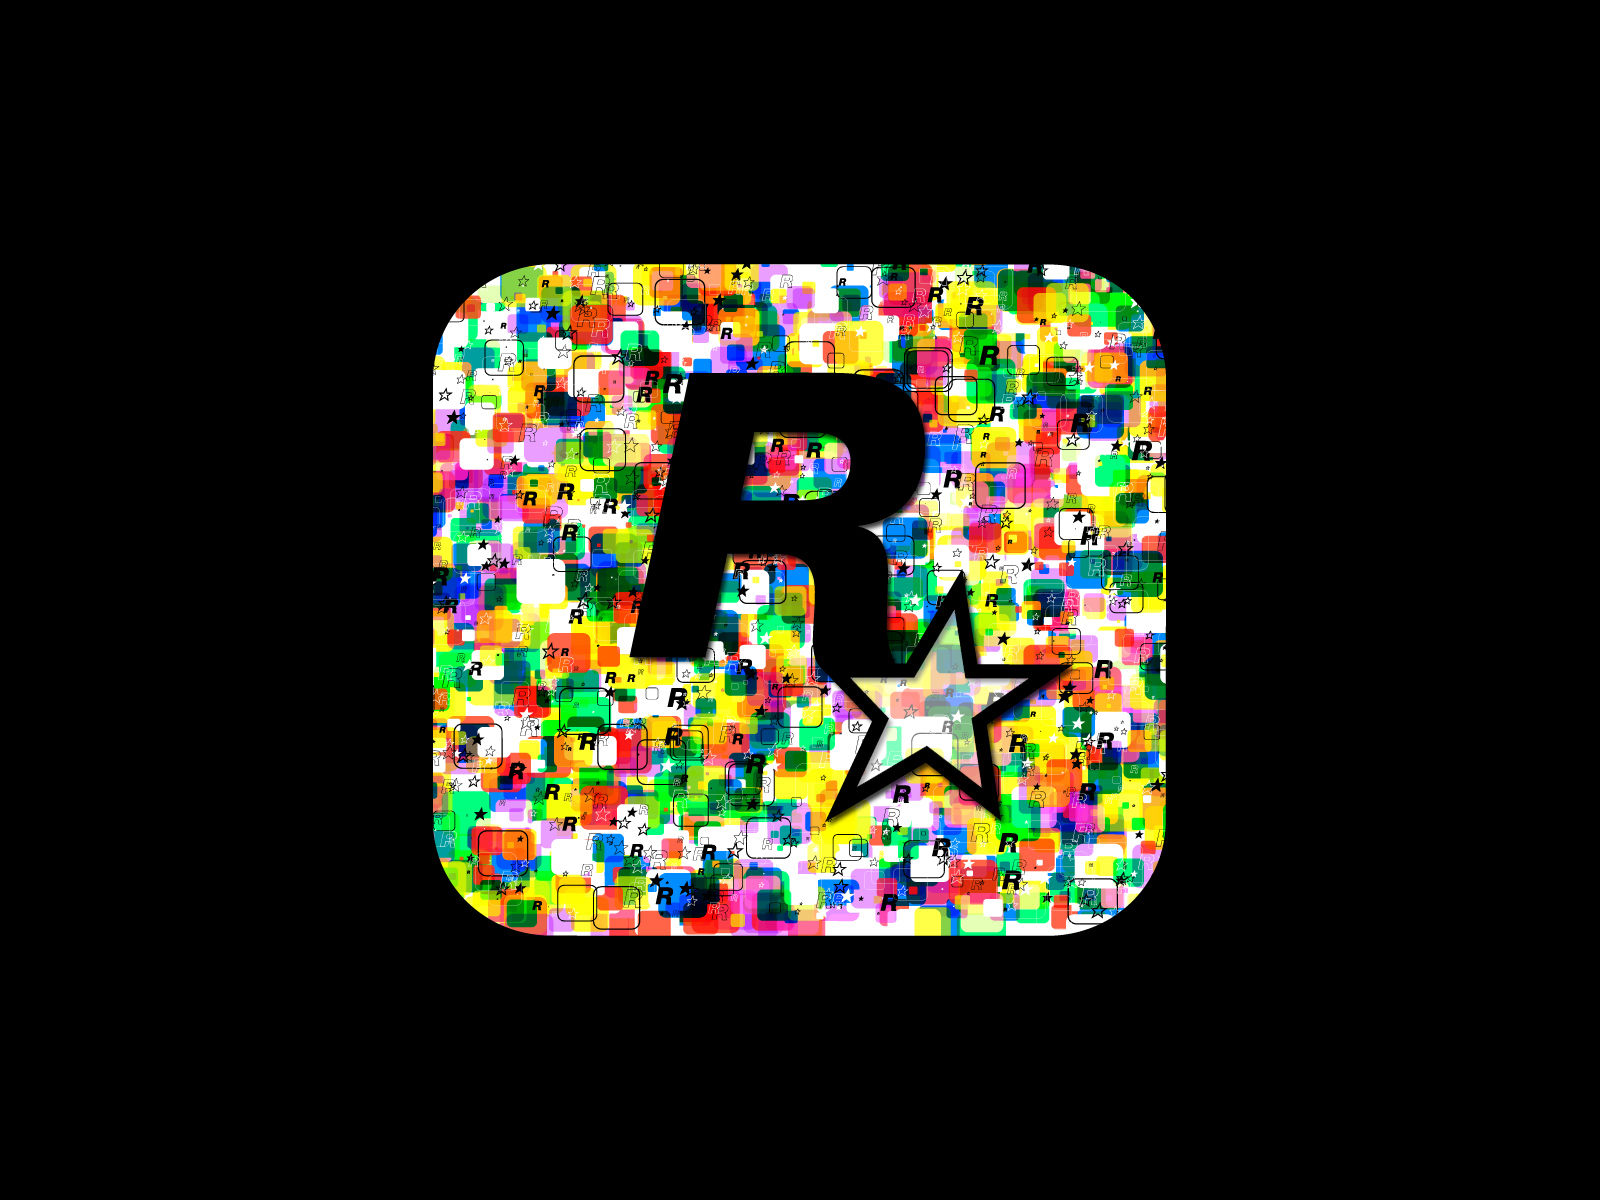 Ipad Retina Hd Wallpaper Rockstar Games: Cool Img Max: Wallpapers